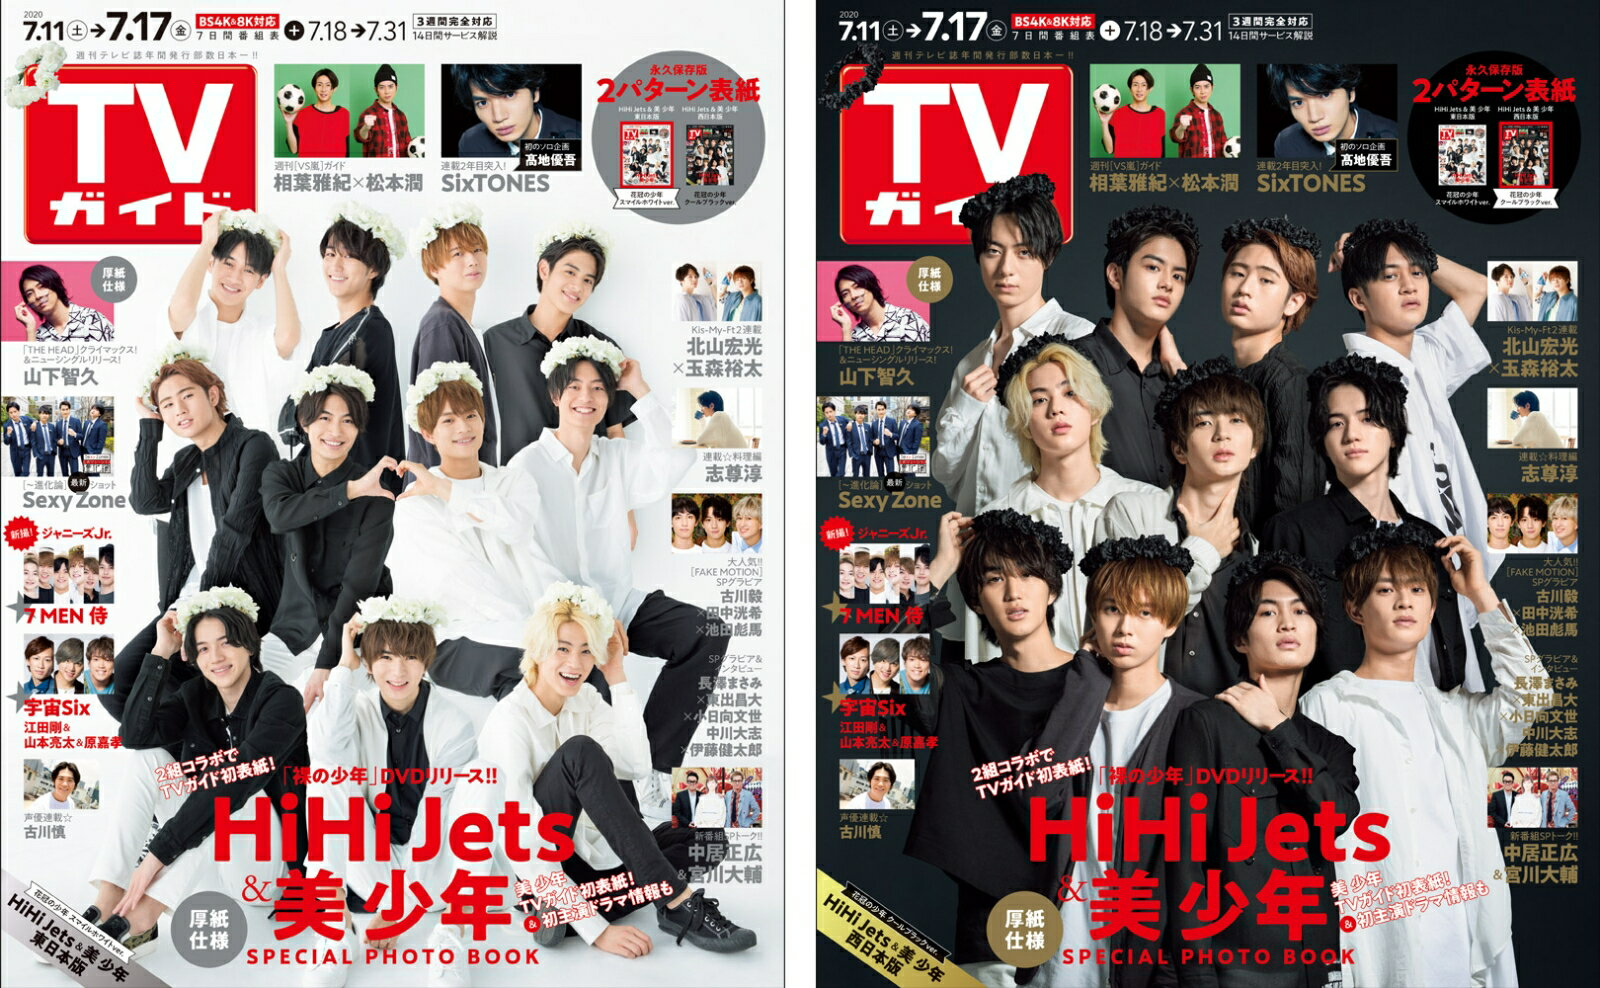 TVガイド 2020年 7/17号 HiHi Jets&美 少年 表紙2パターン刷り分け号セット[雑誌]